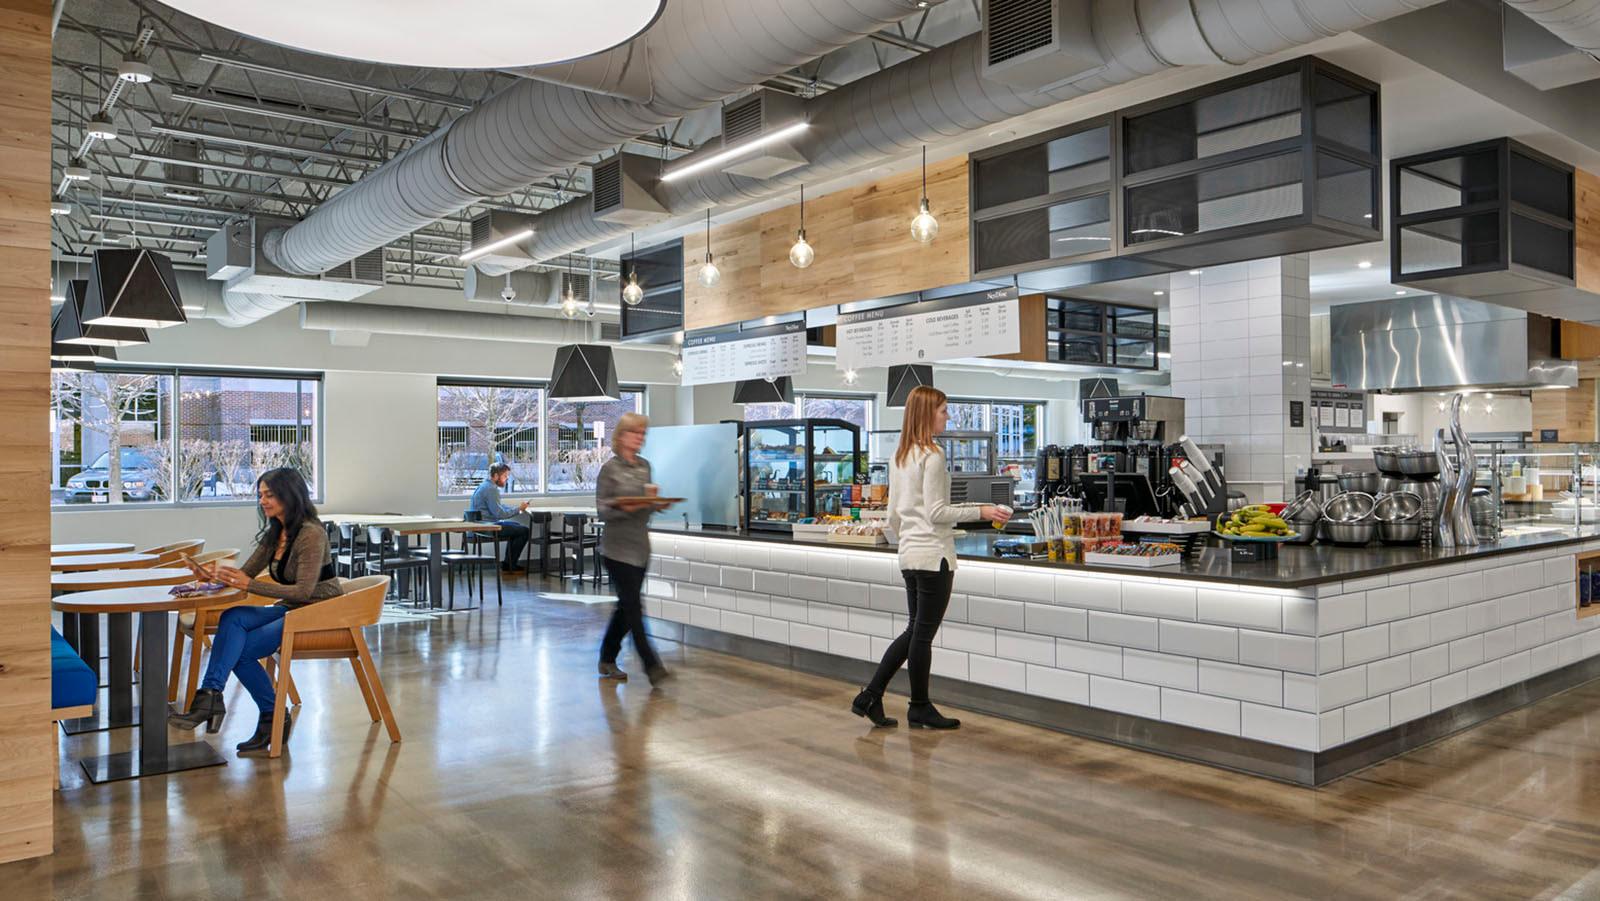 Sun Life Financial food service workplace